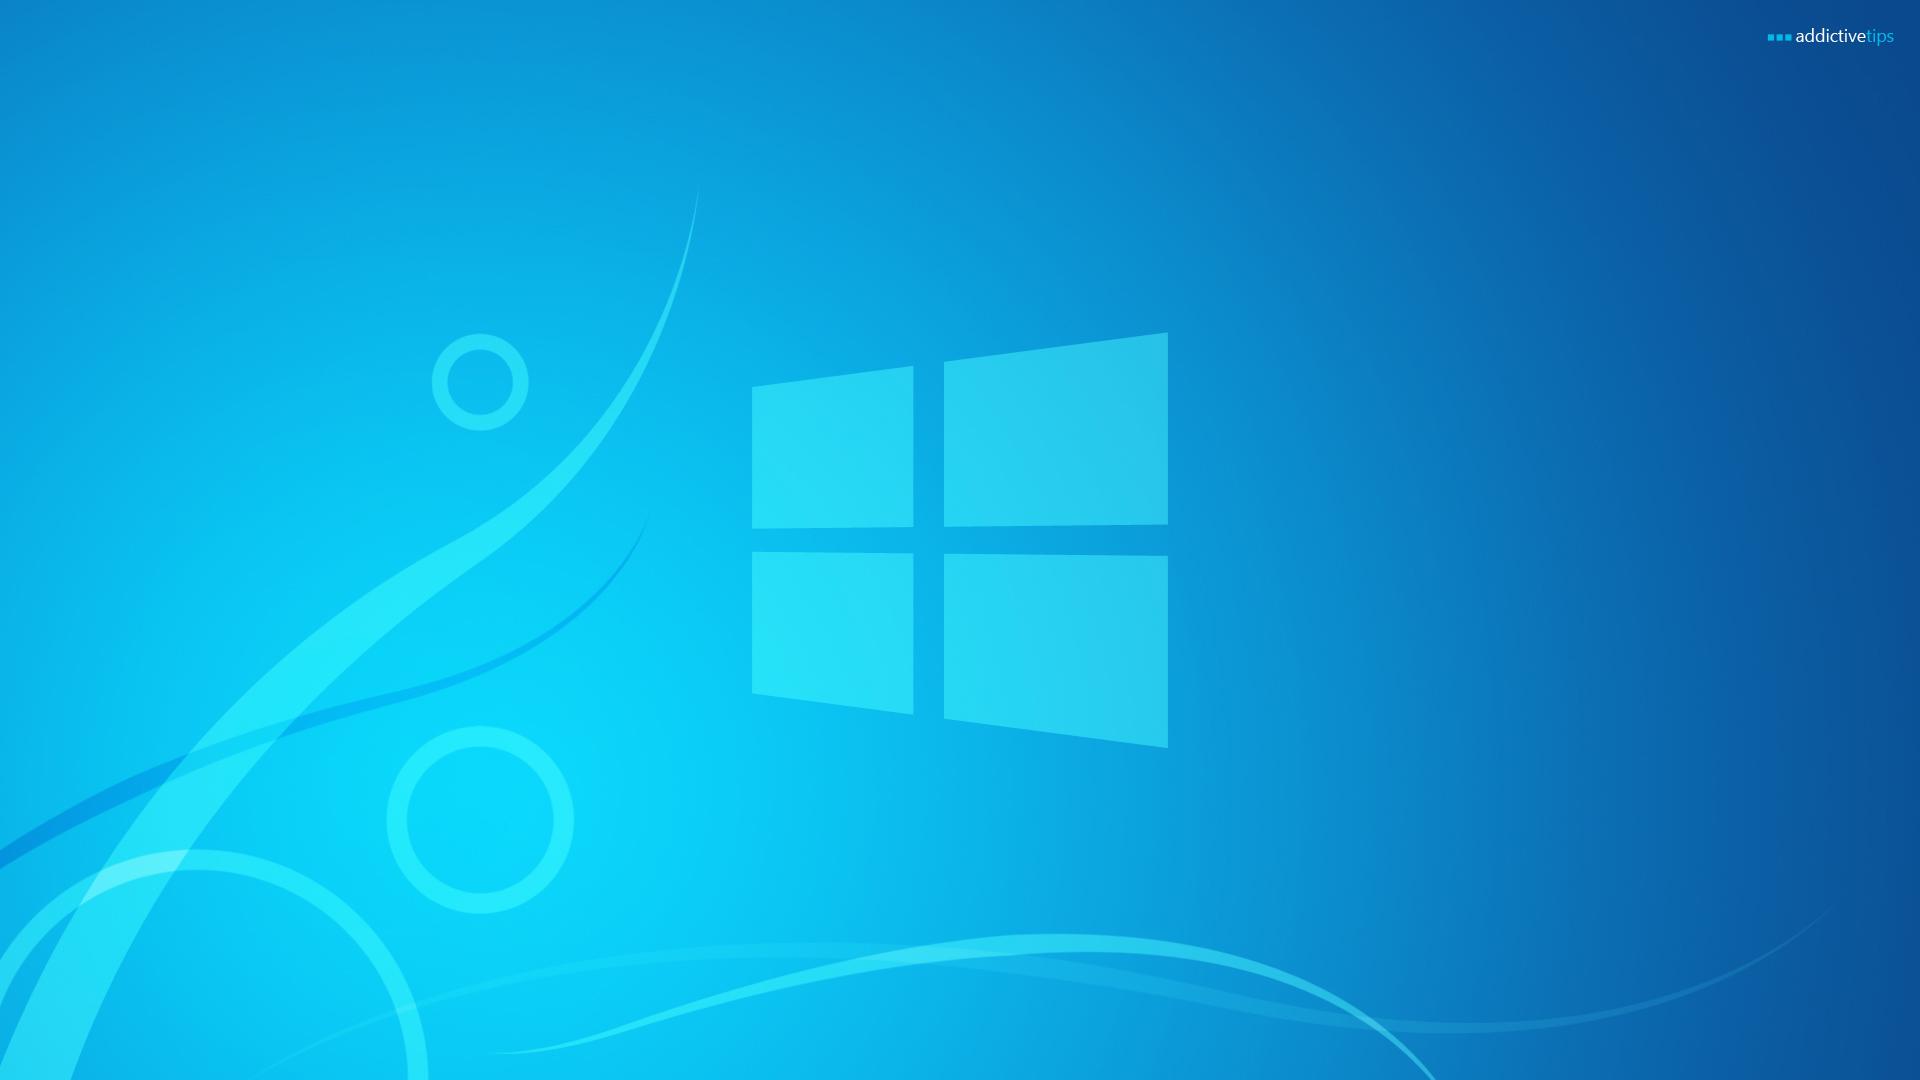 Windows 8 desktop backgrounds